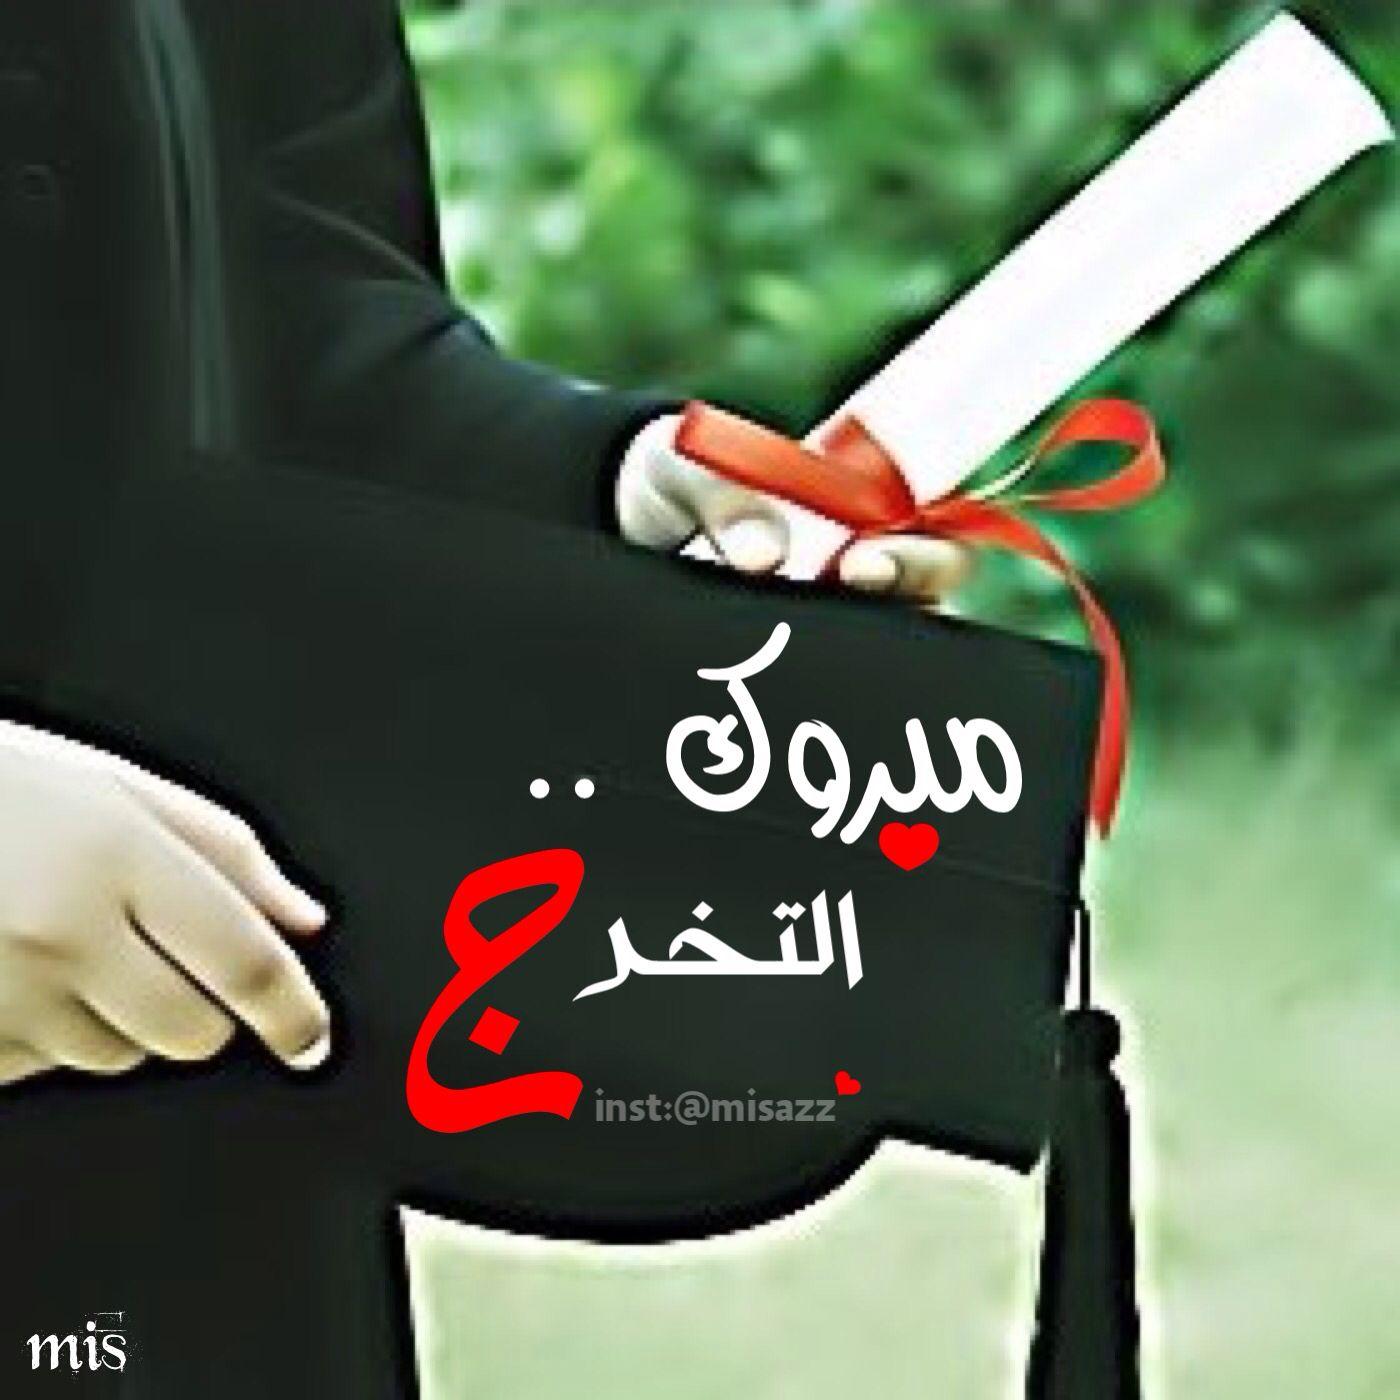 مبروك التخرج Congratulations Graduation Happy Birthday